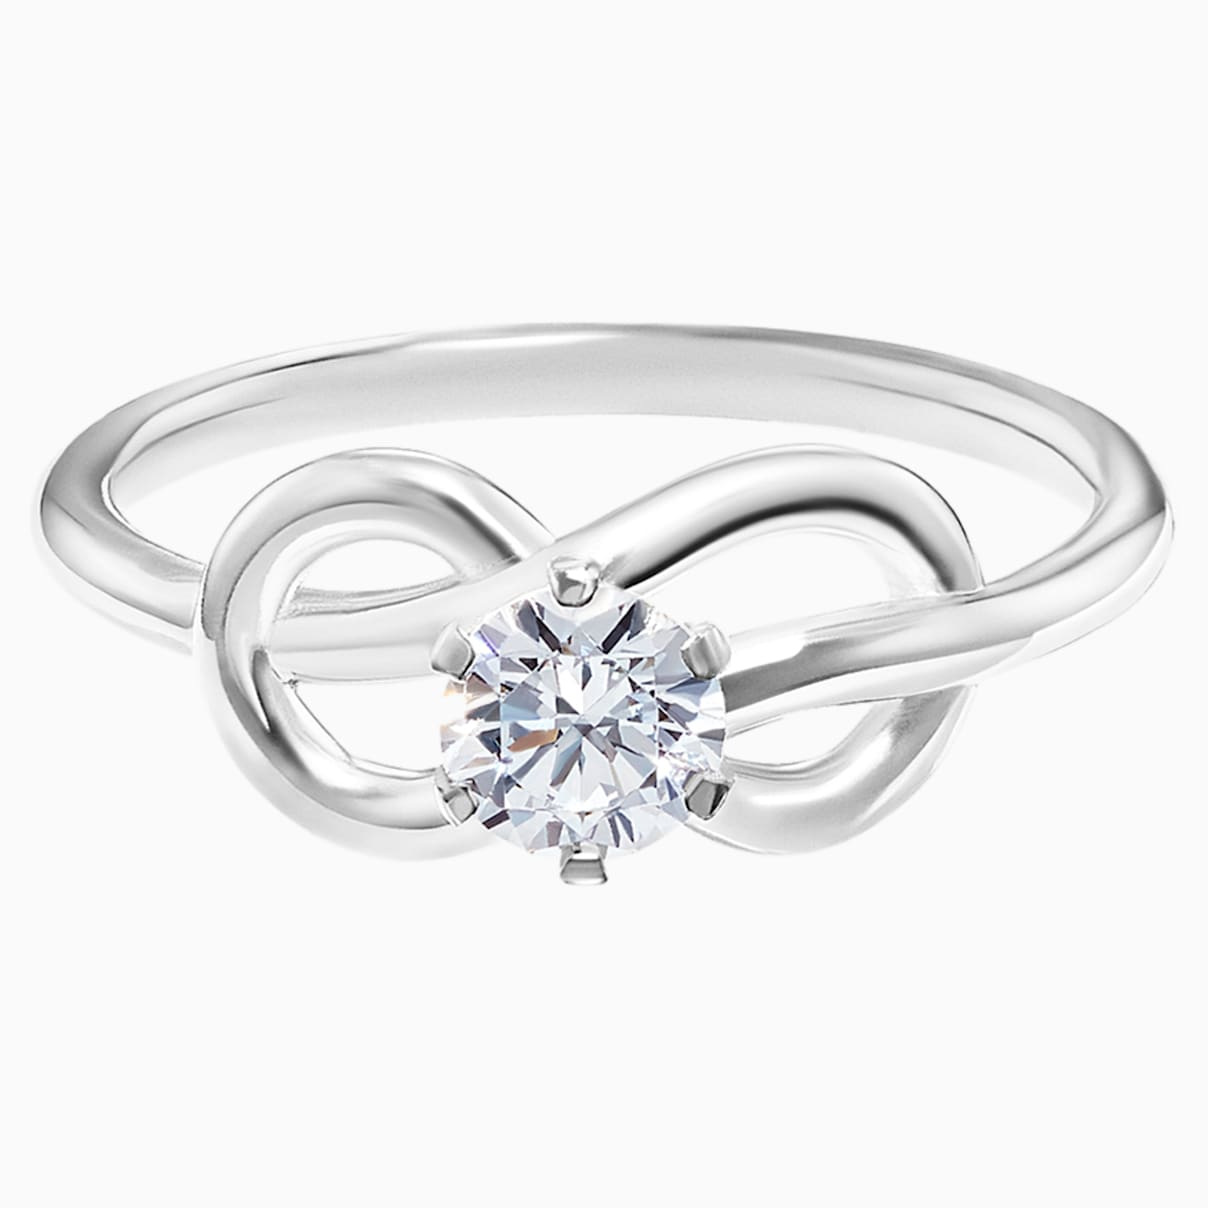 Knot of True Love Savoy Ring 0.25ct, Swarovski Created Diamonds, 18K White Gold, Size 58